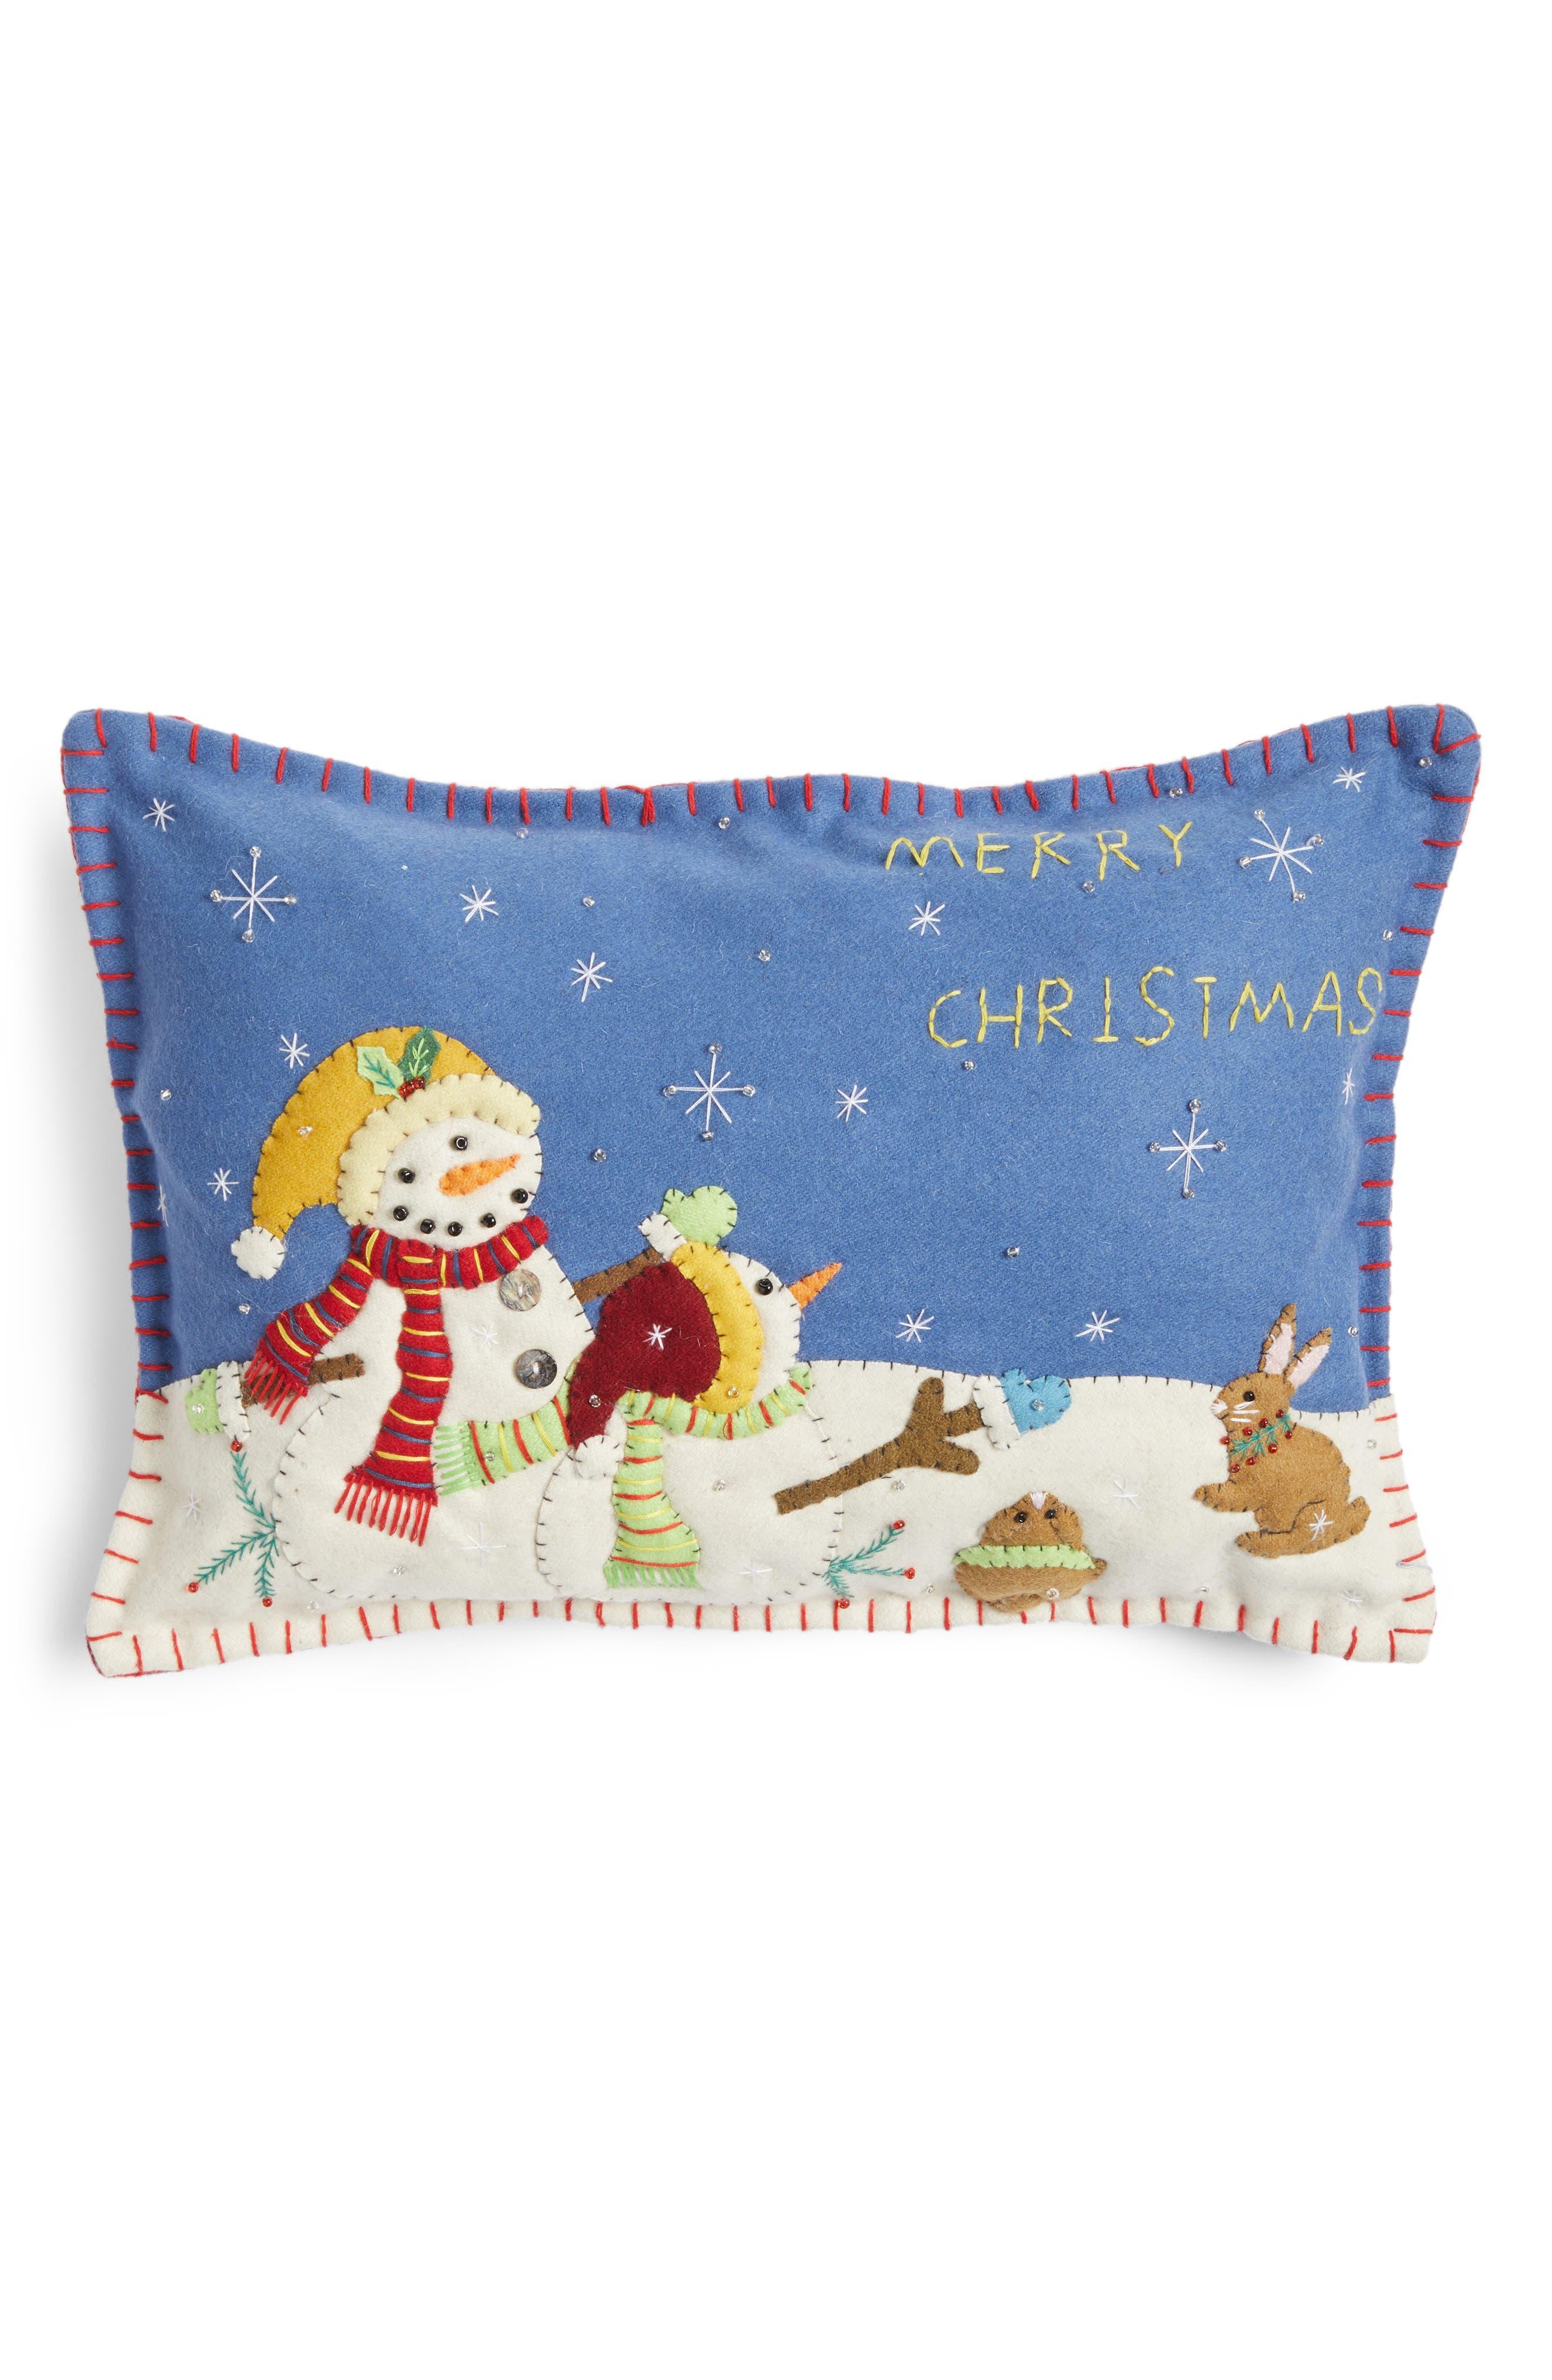 Snowman Pillow,                             Main thumbnail 1, color,                             400